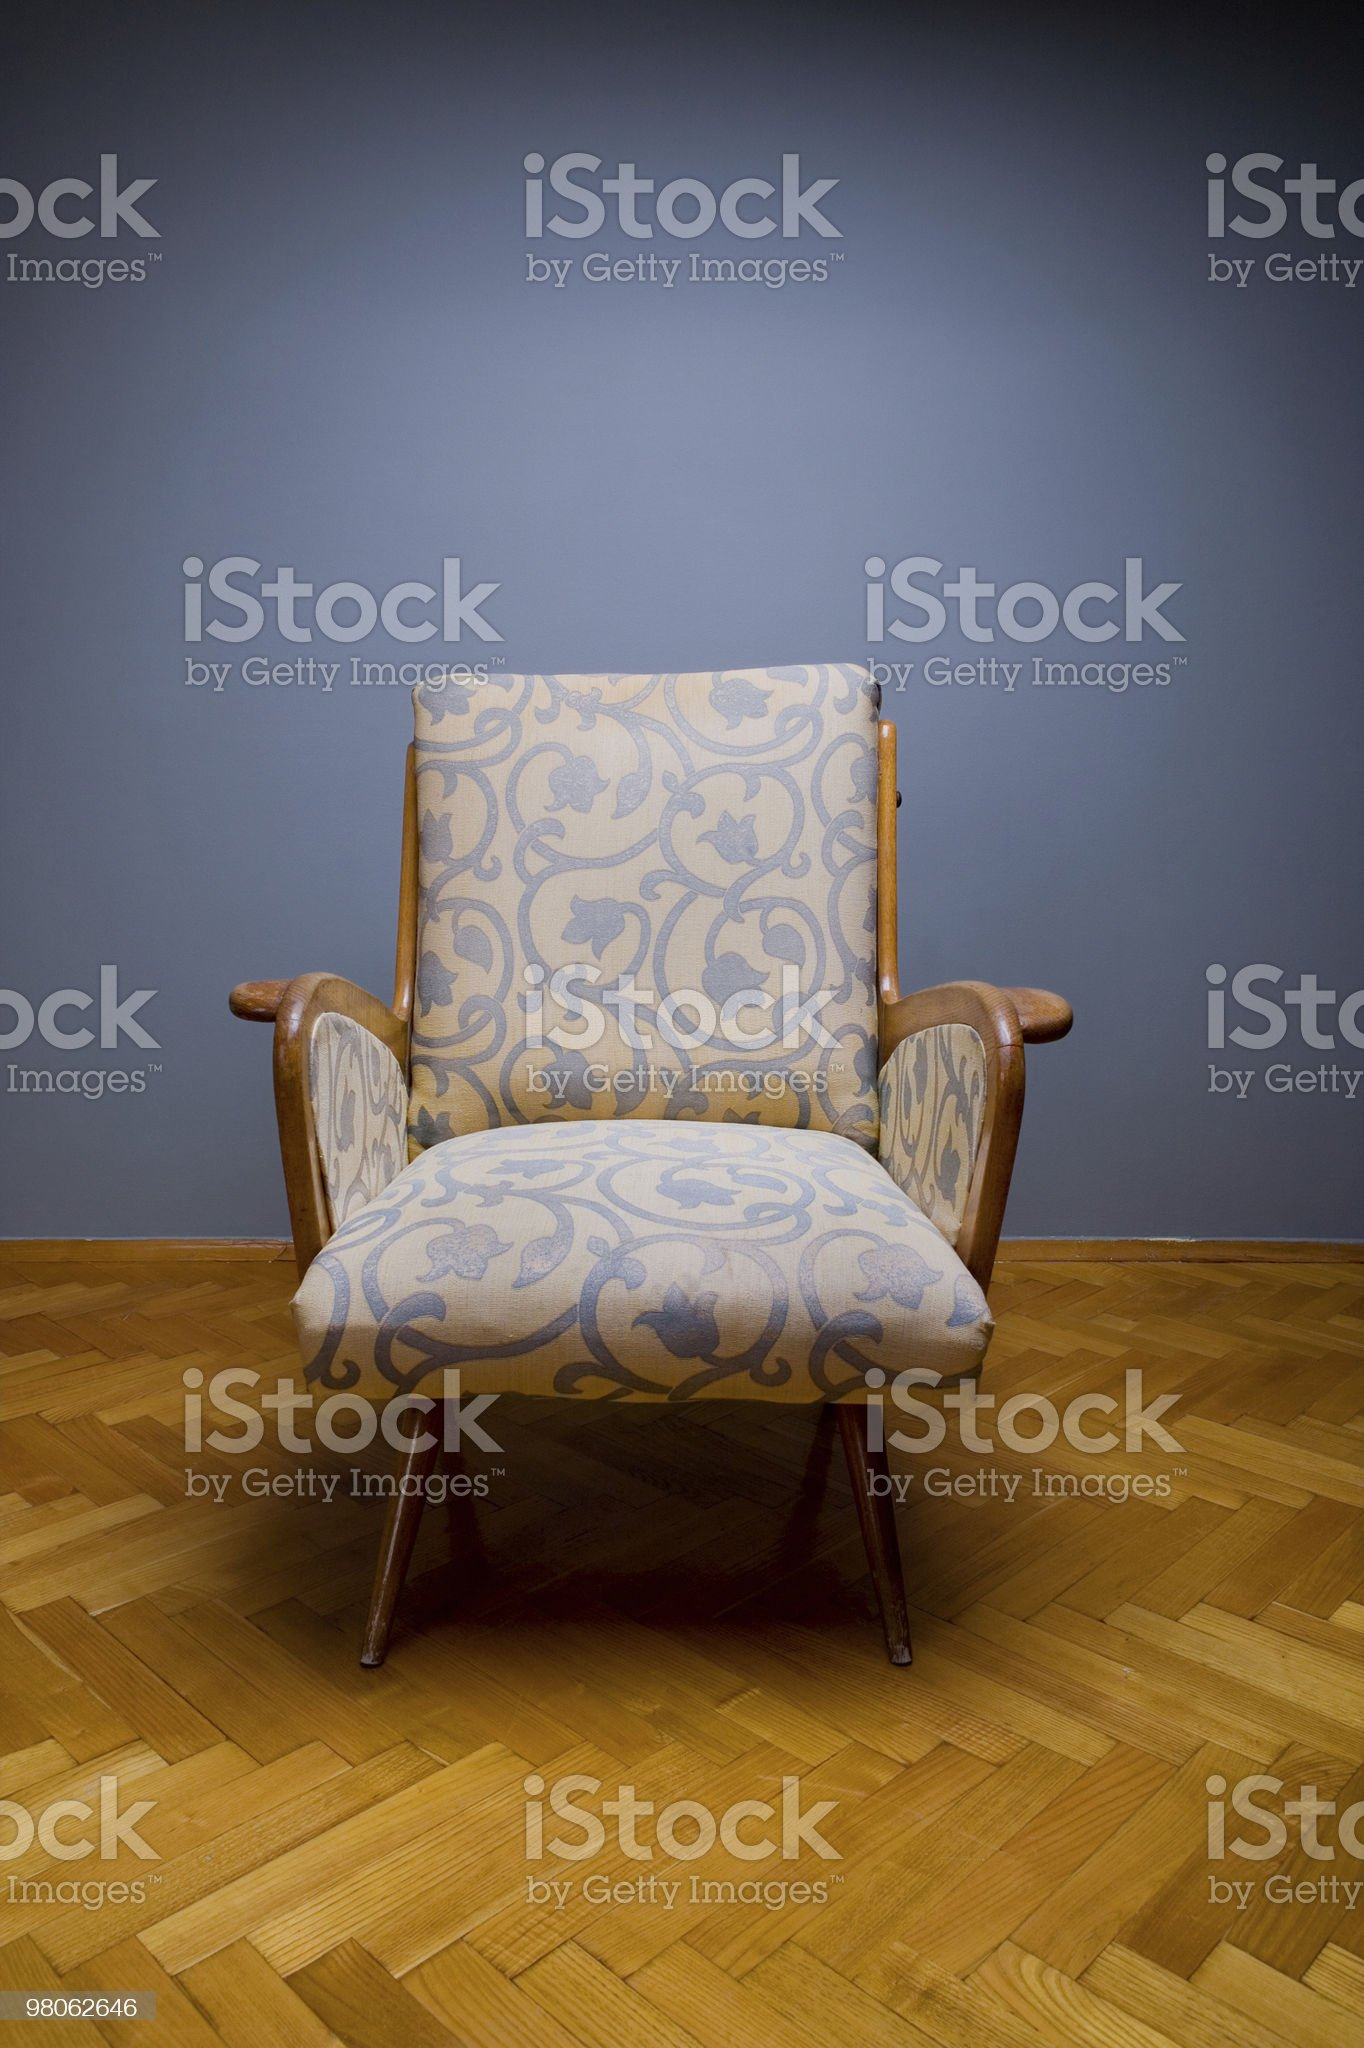 Vintage armchair royalty-free stock photo